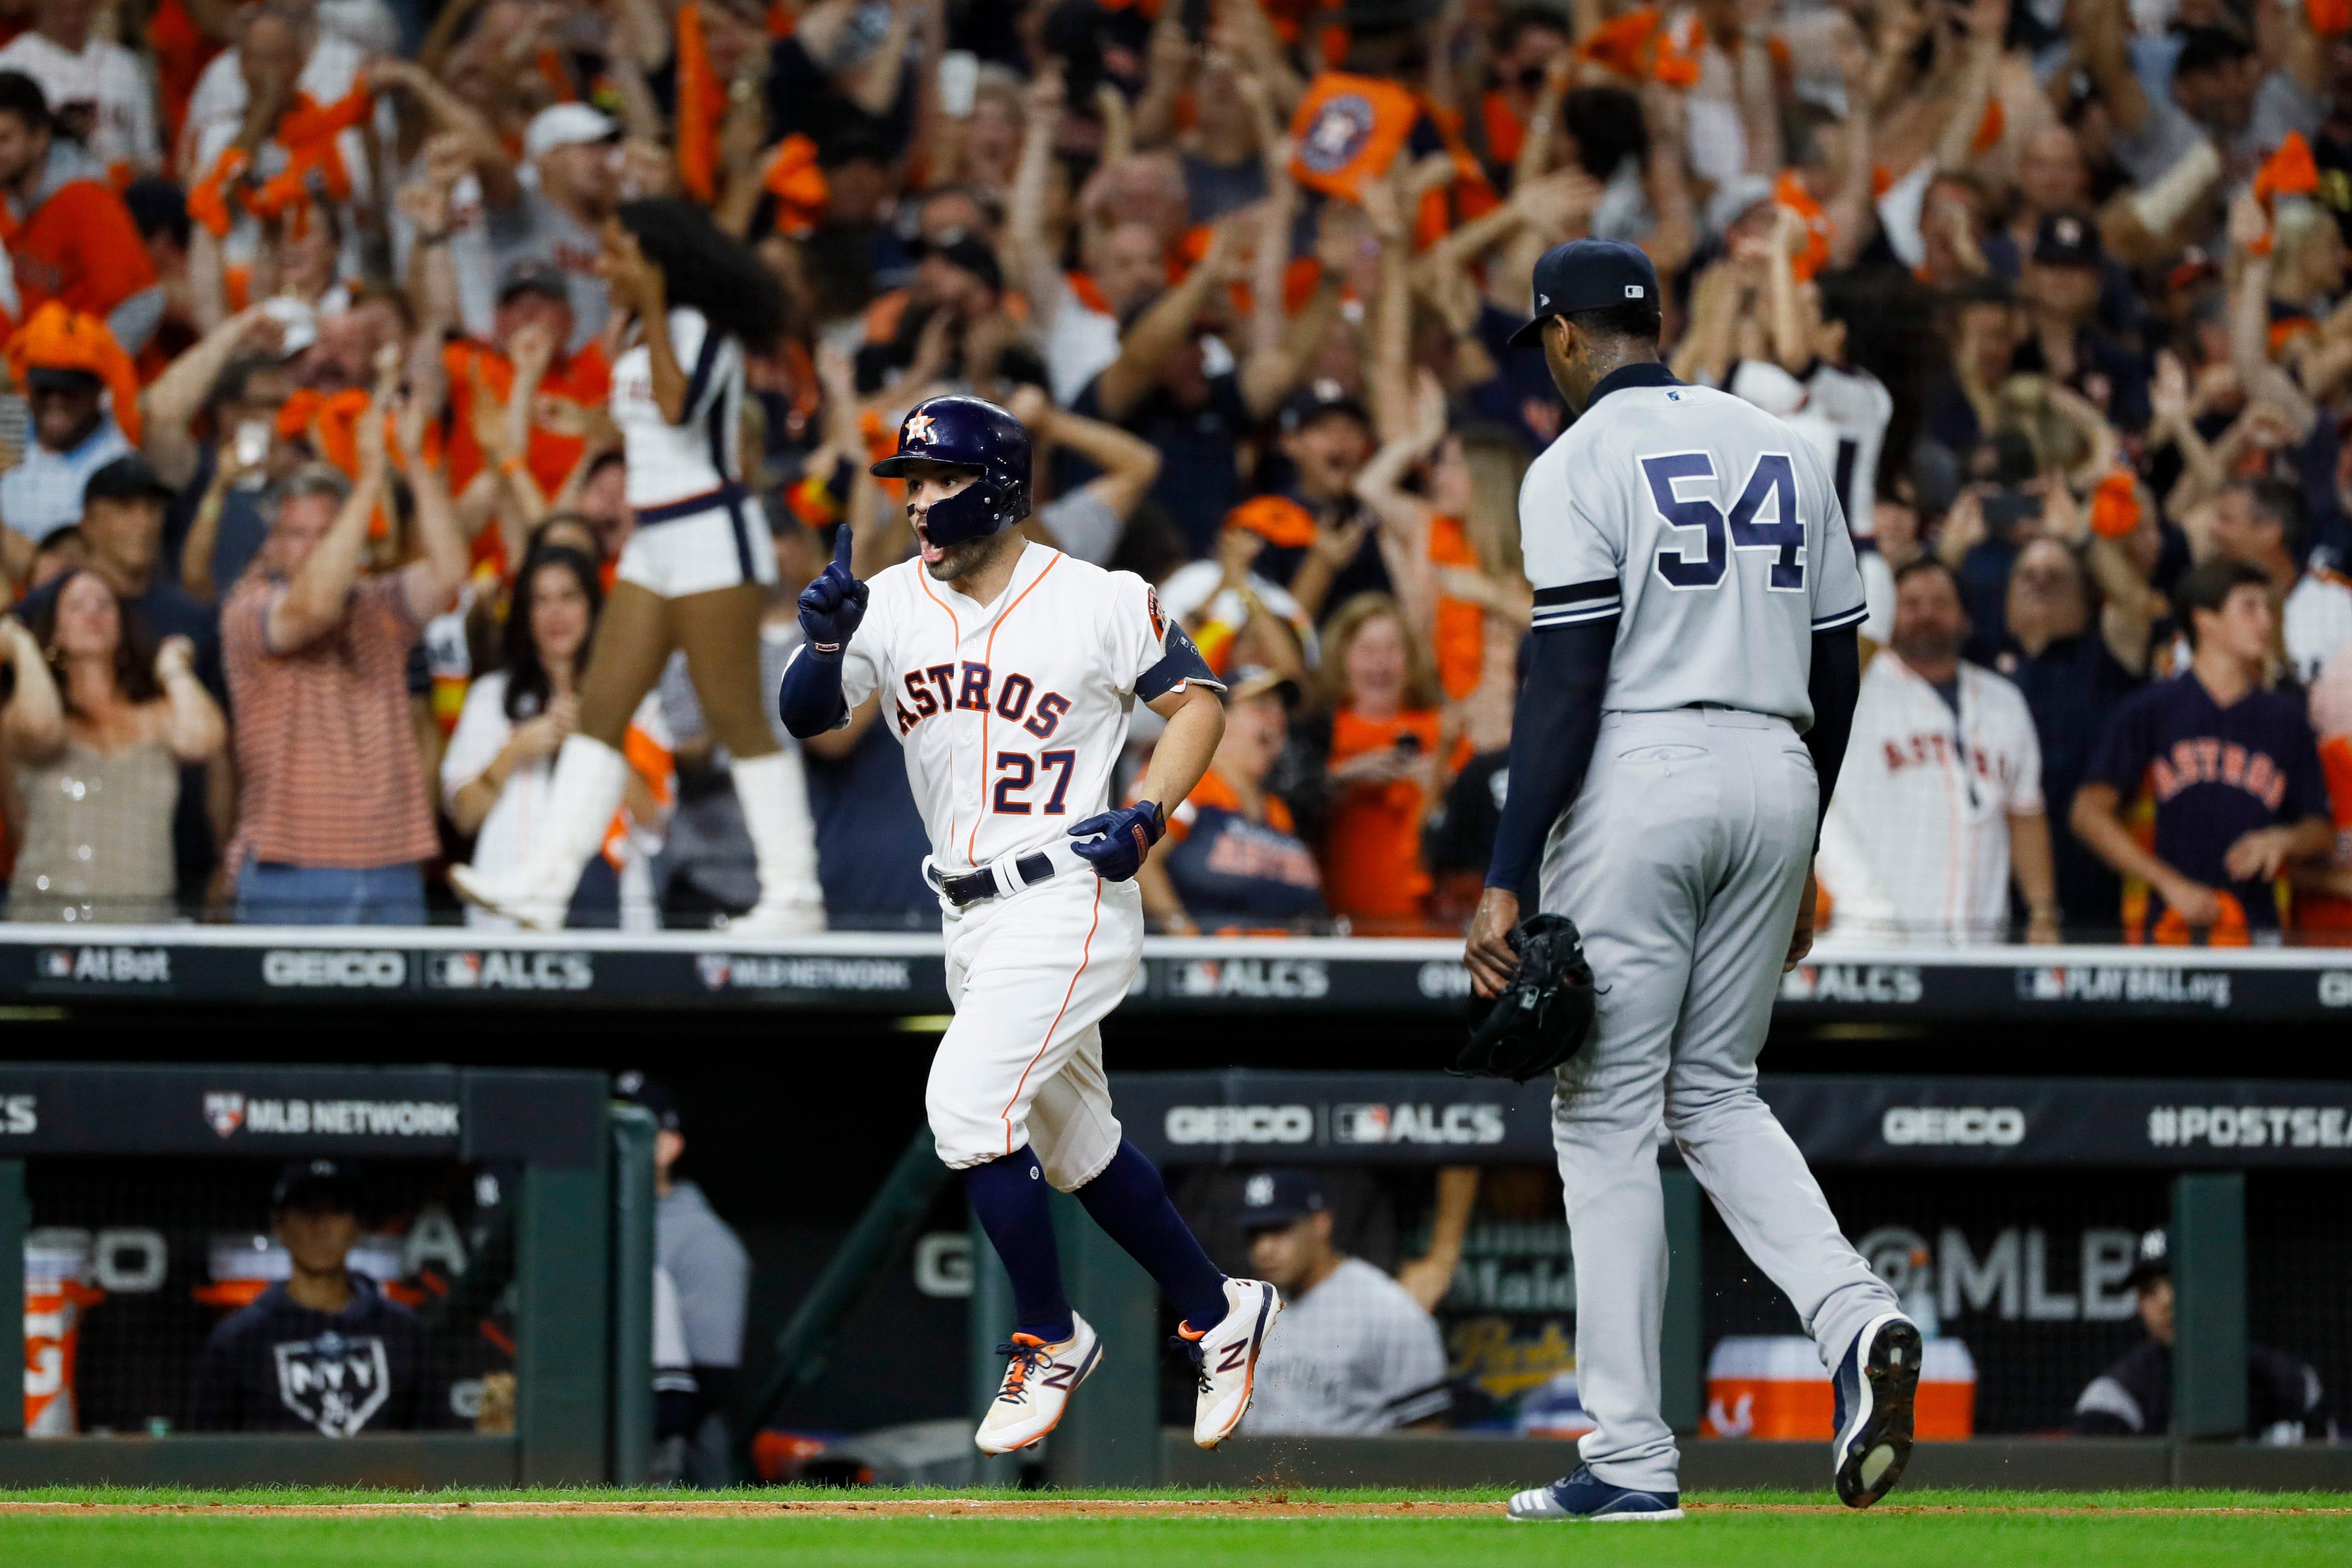 New York Yankees` season ends on Jose Altuve walk-off two-run homer